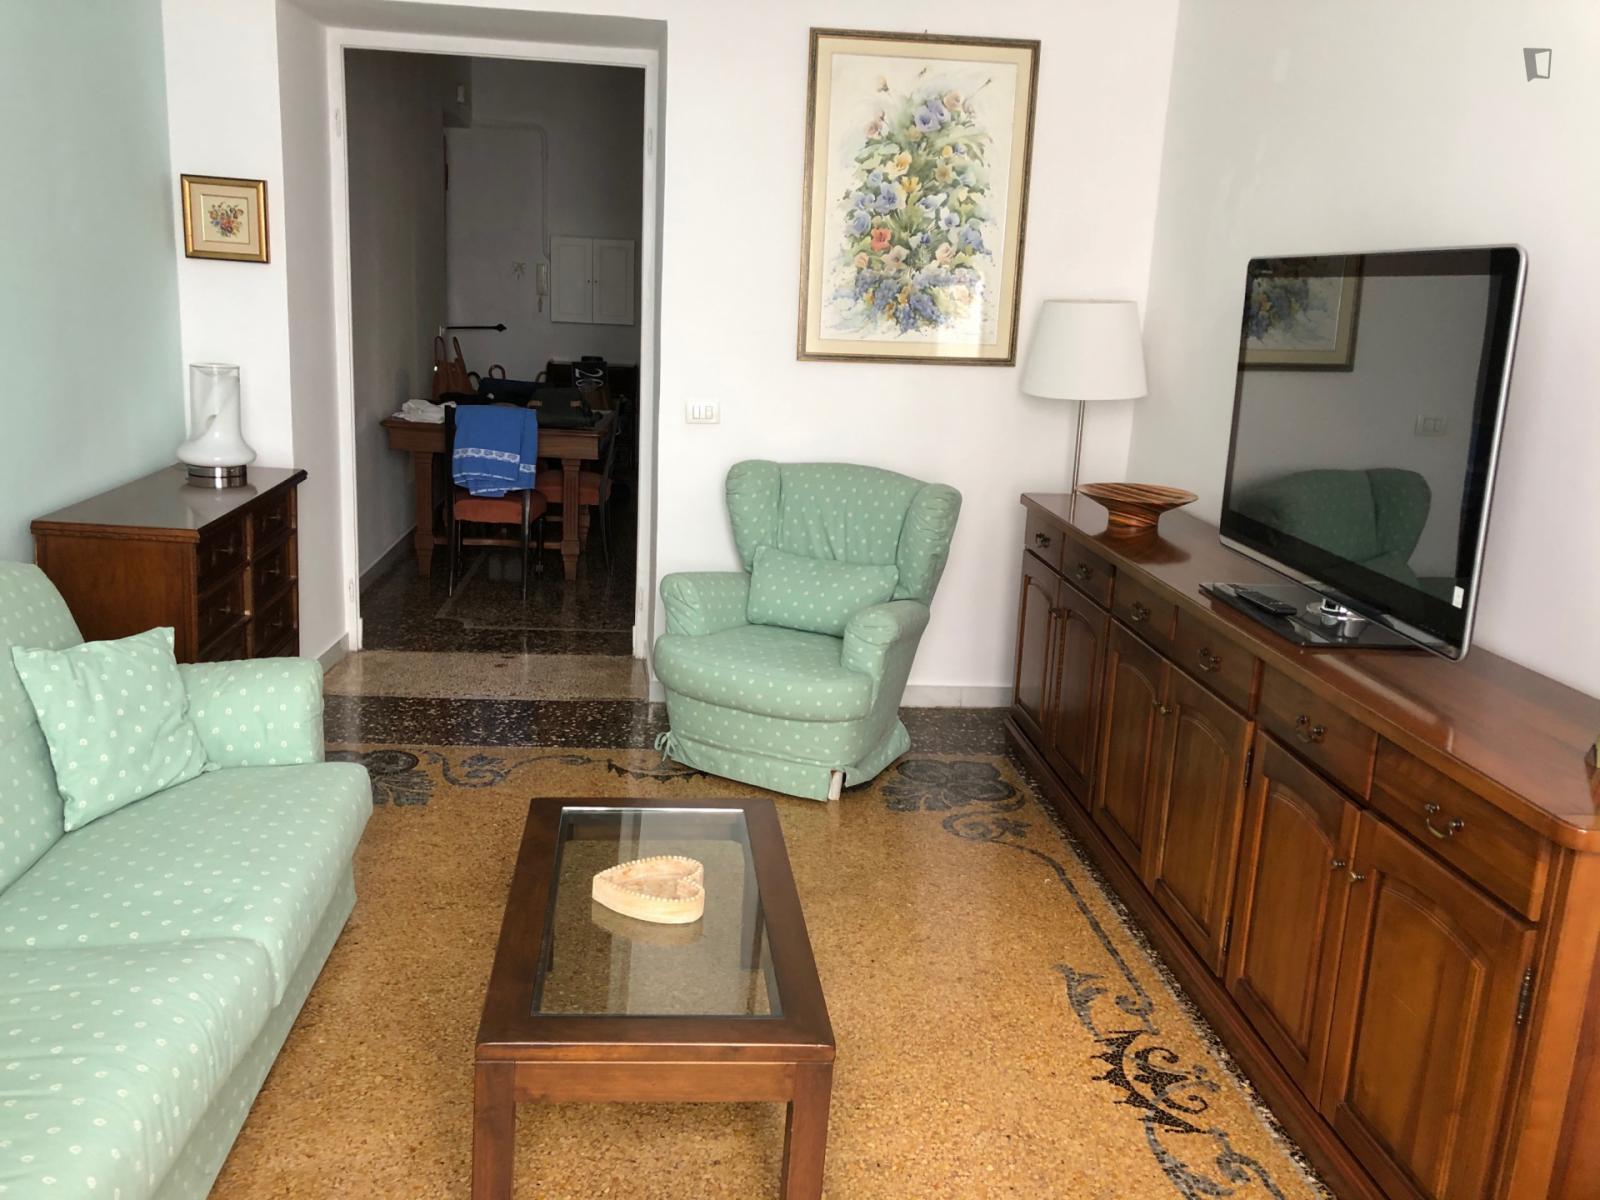 Via Sampierdarena, Genoa, NV - 1,200 USD/ month